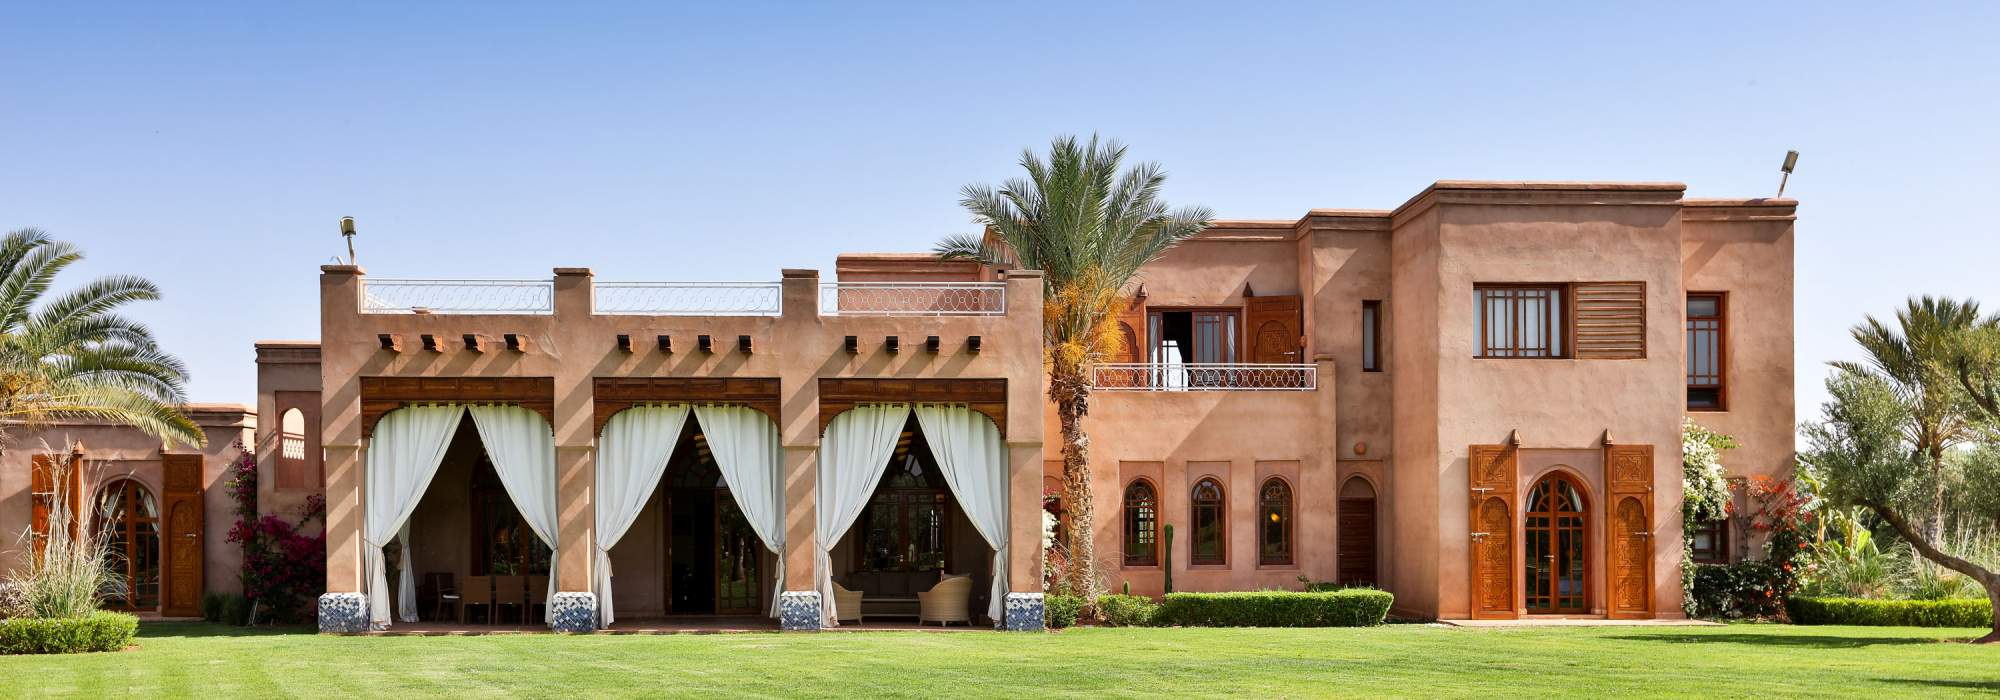 Villa a vendre Contemporain  marrakech